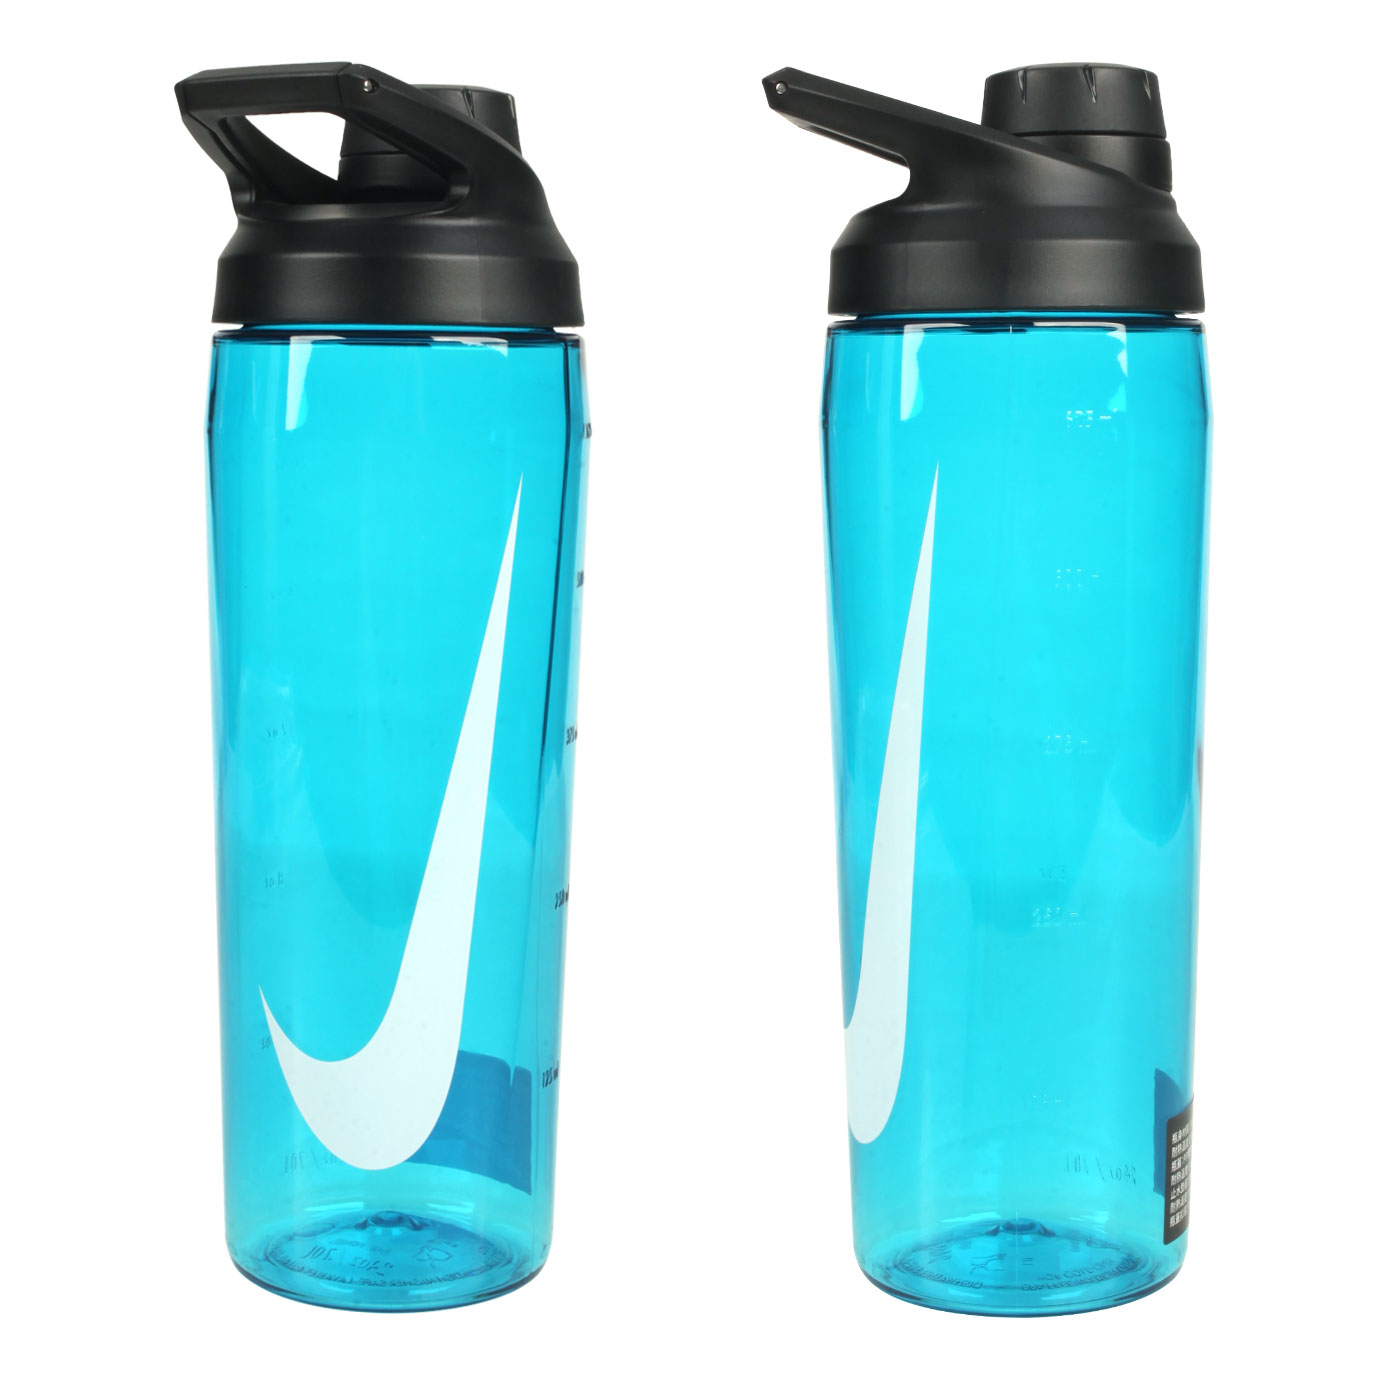 NIKE 24OZ 大口徑水壺 N100062202524 - 藍白